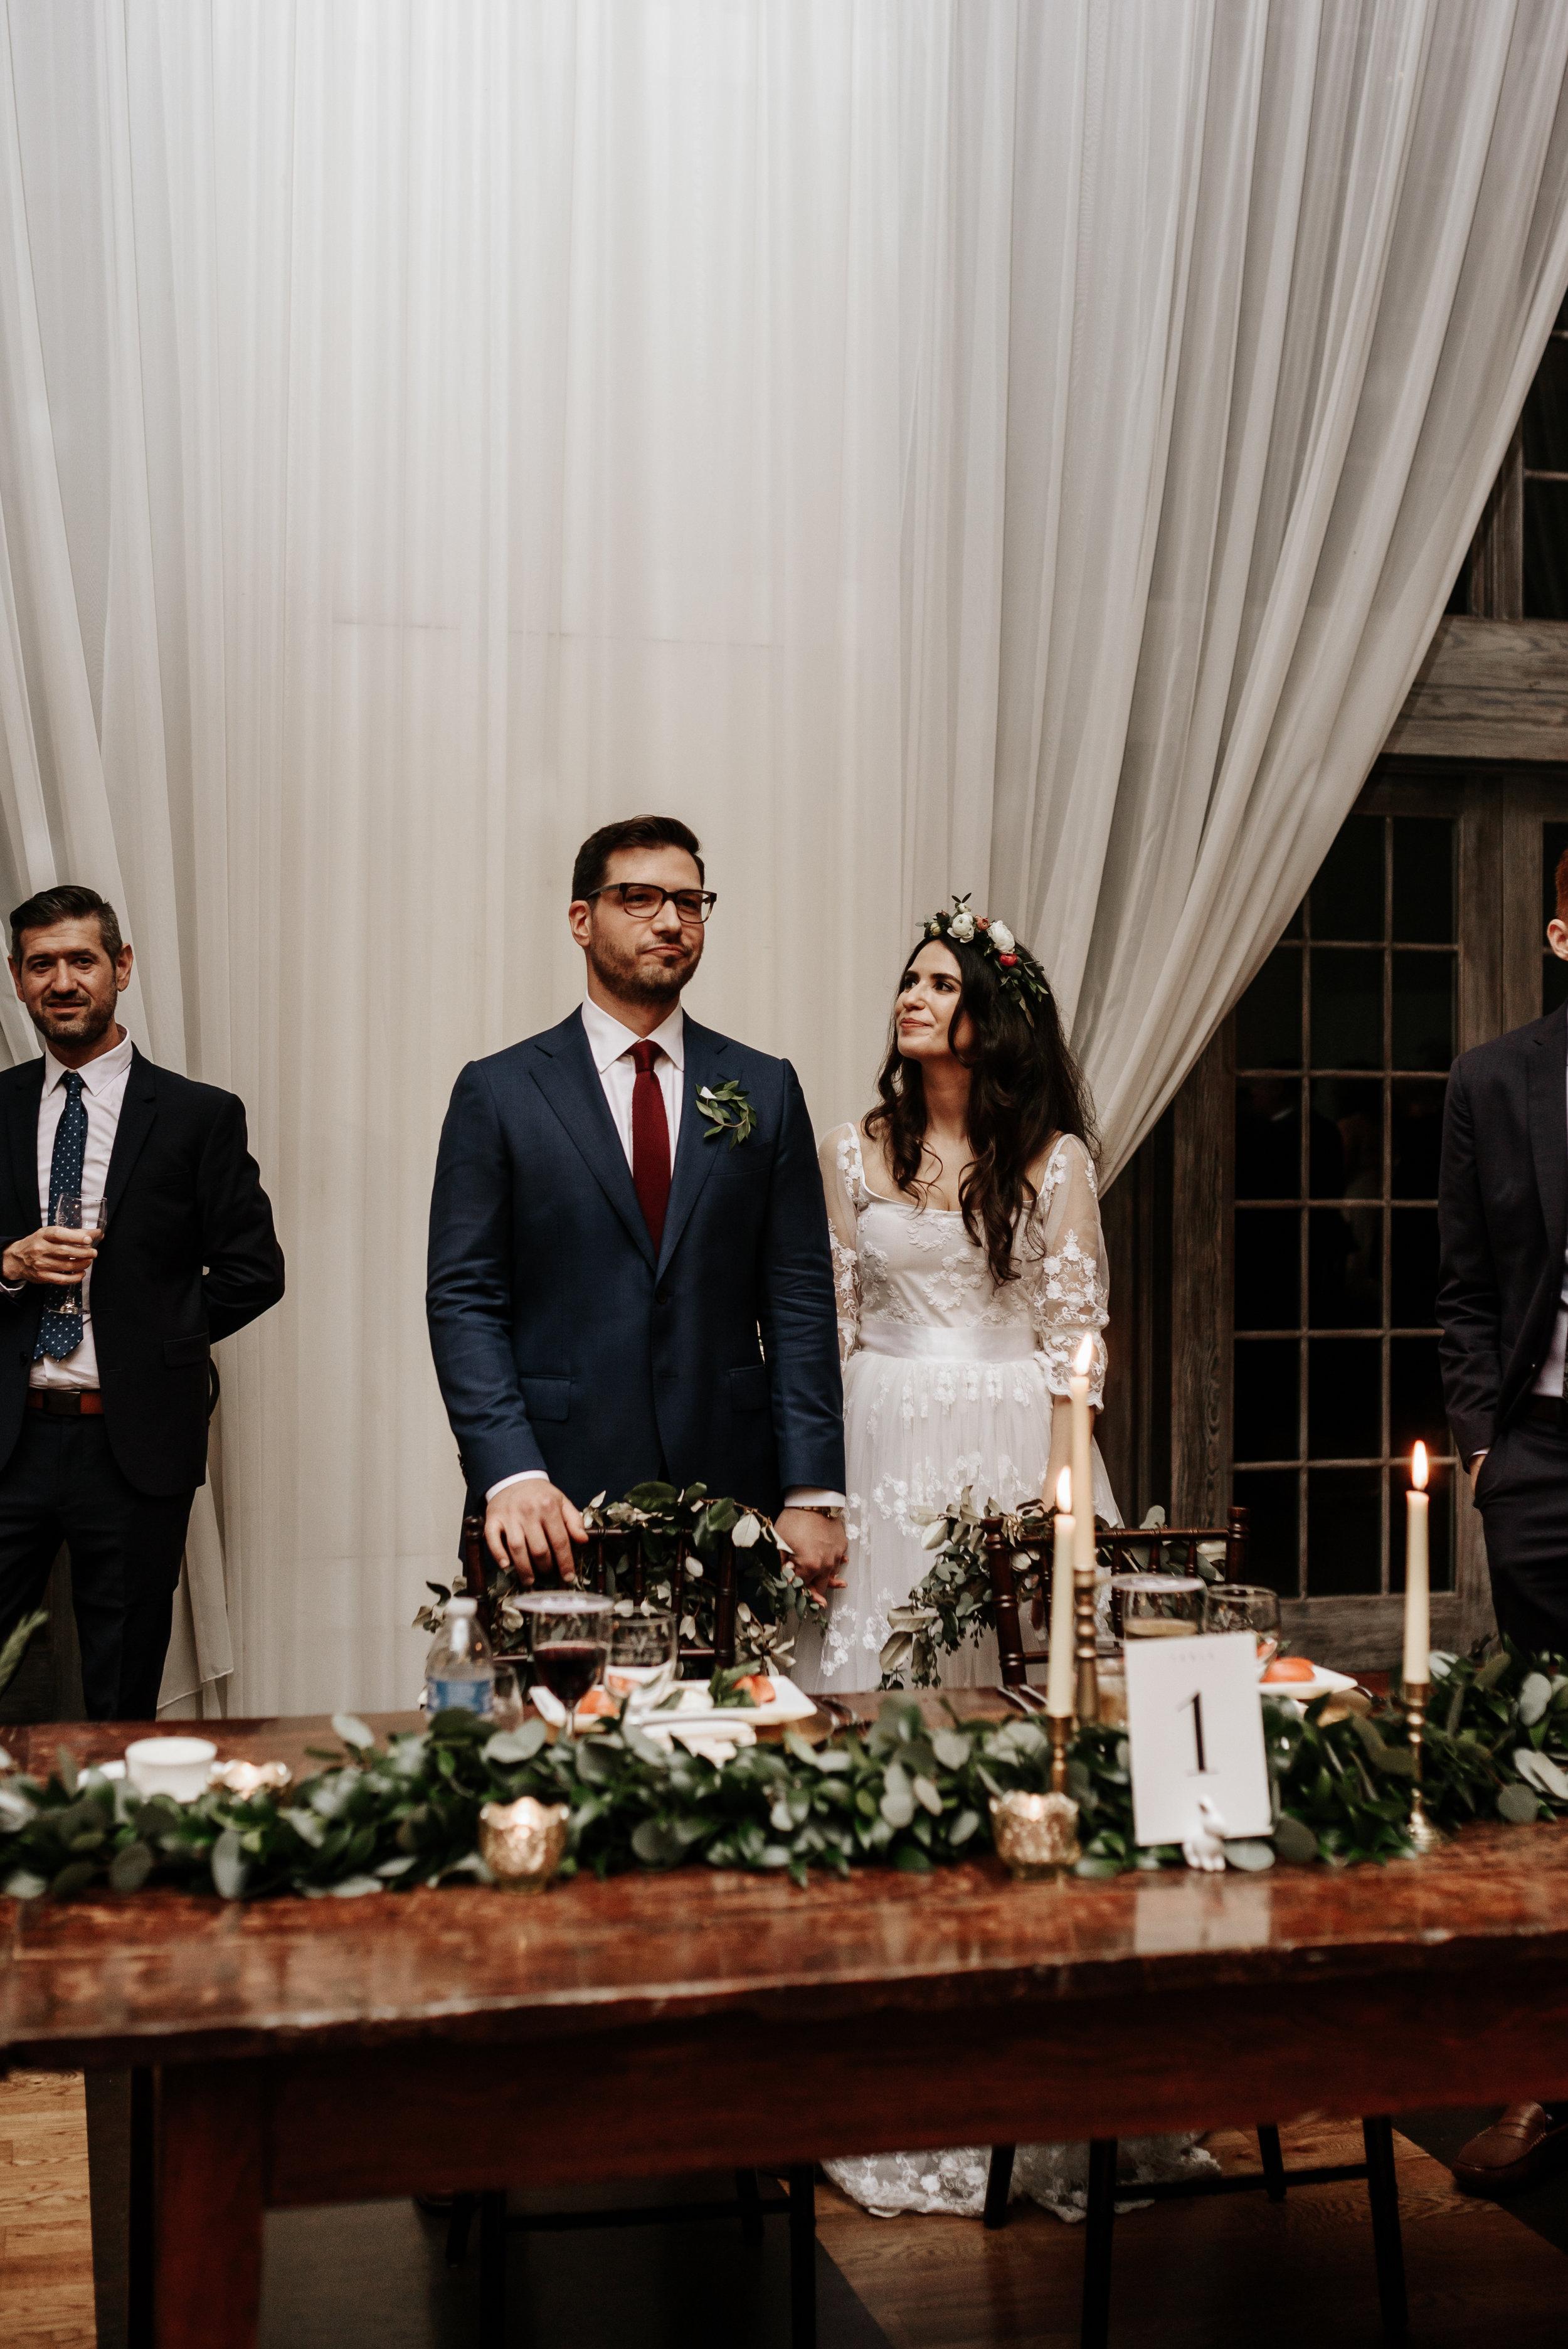 Veritas-Vineyards-and-Winery-Wedding-Photography-Afton-Virginia-Yasmin-Seth-Photography-by-V-9908.jpg